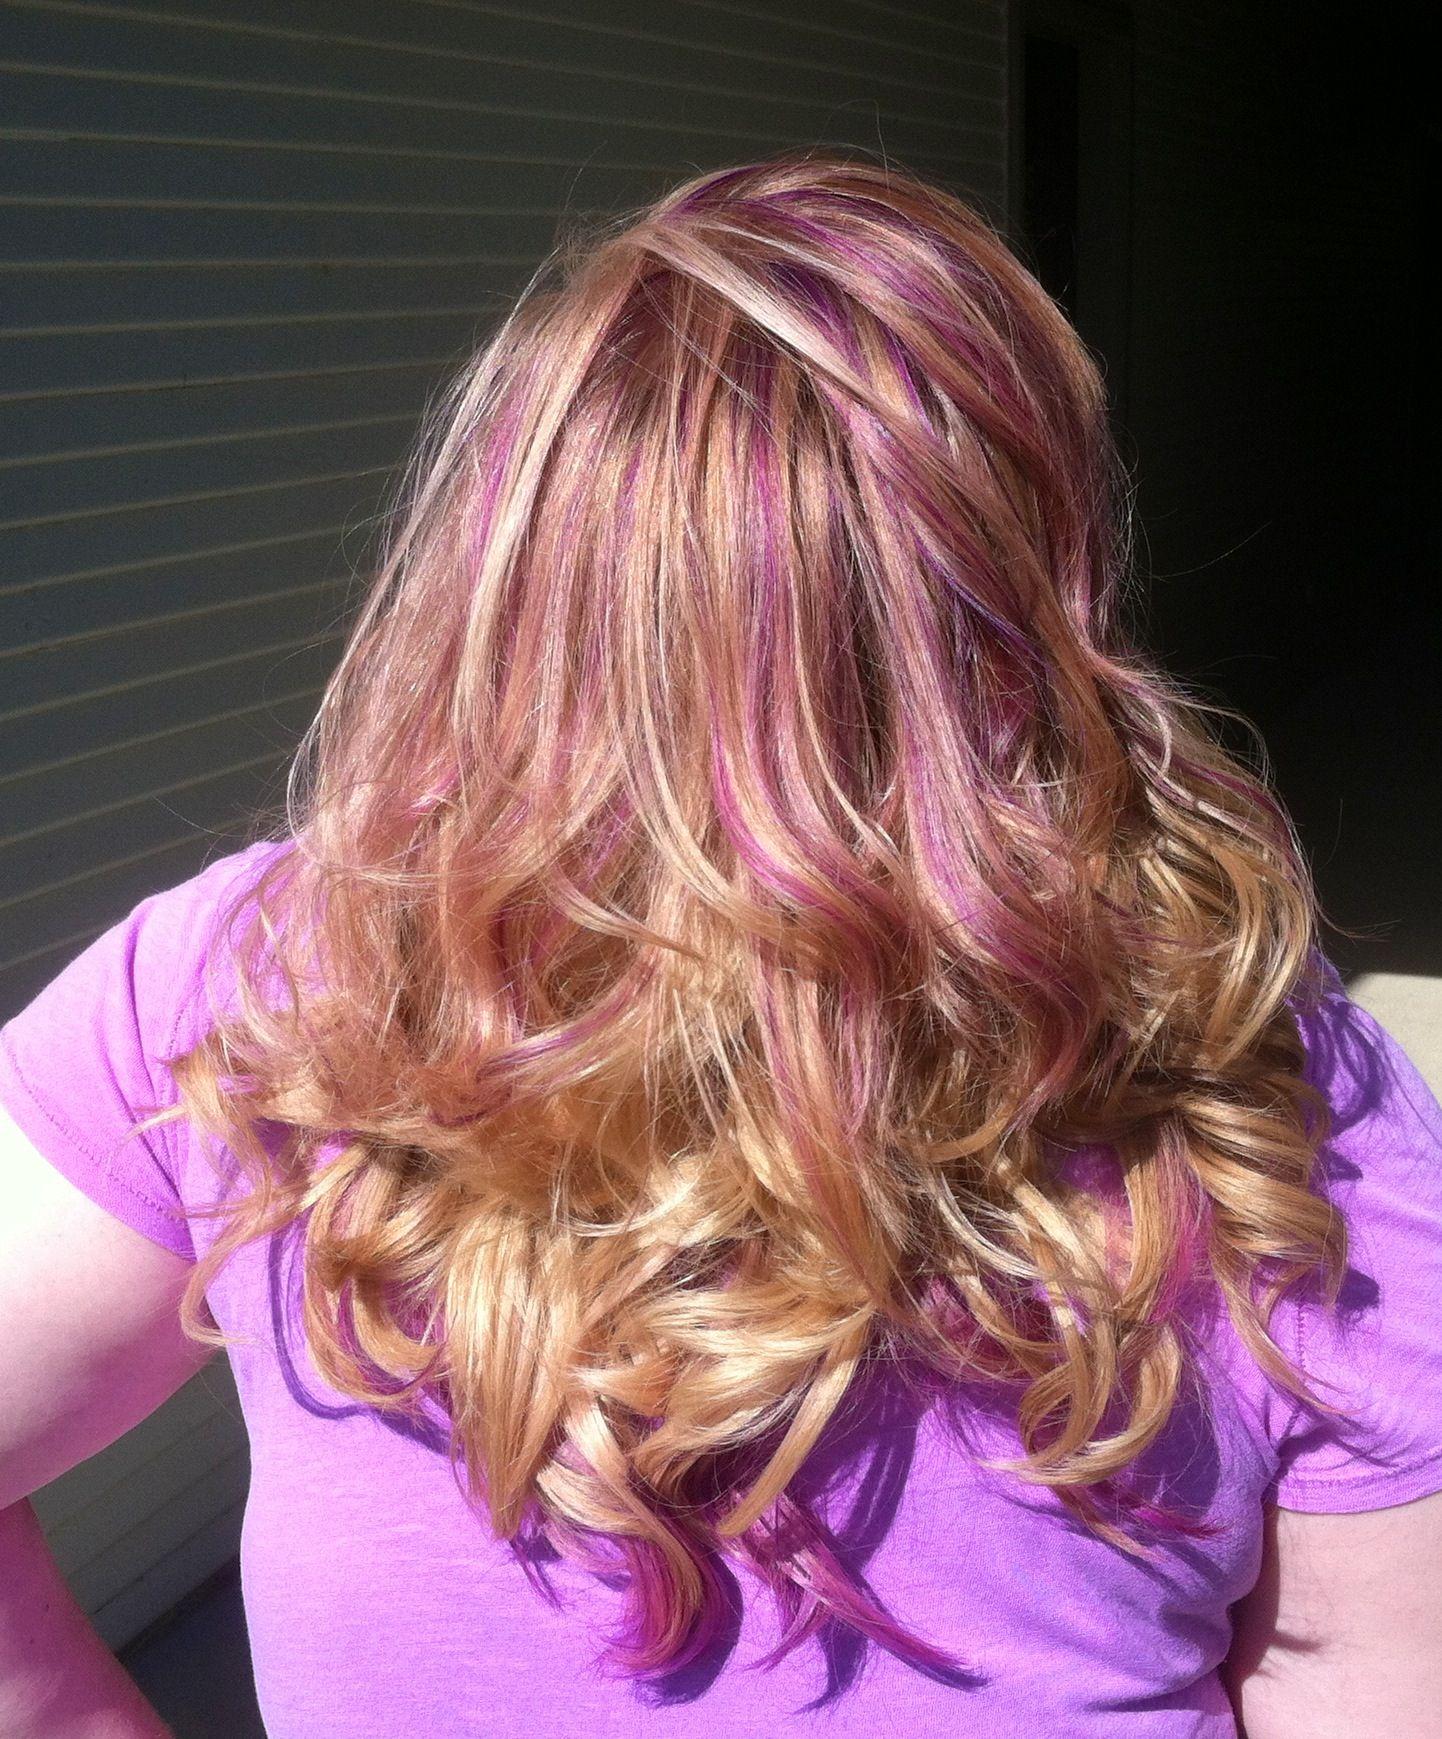 Pin By Sarrenna Mcnulty On Redheads Pinterest Hair Purple